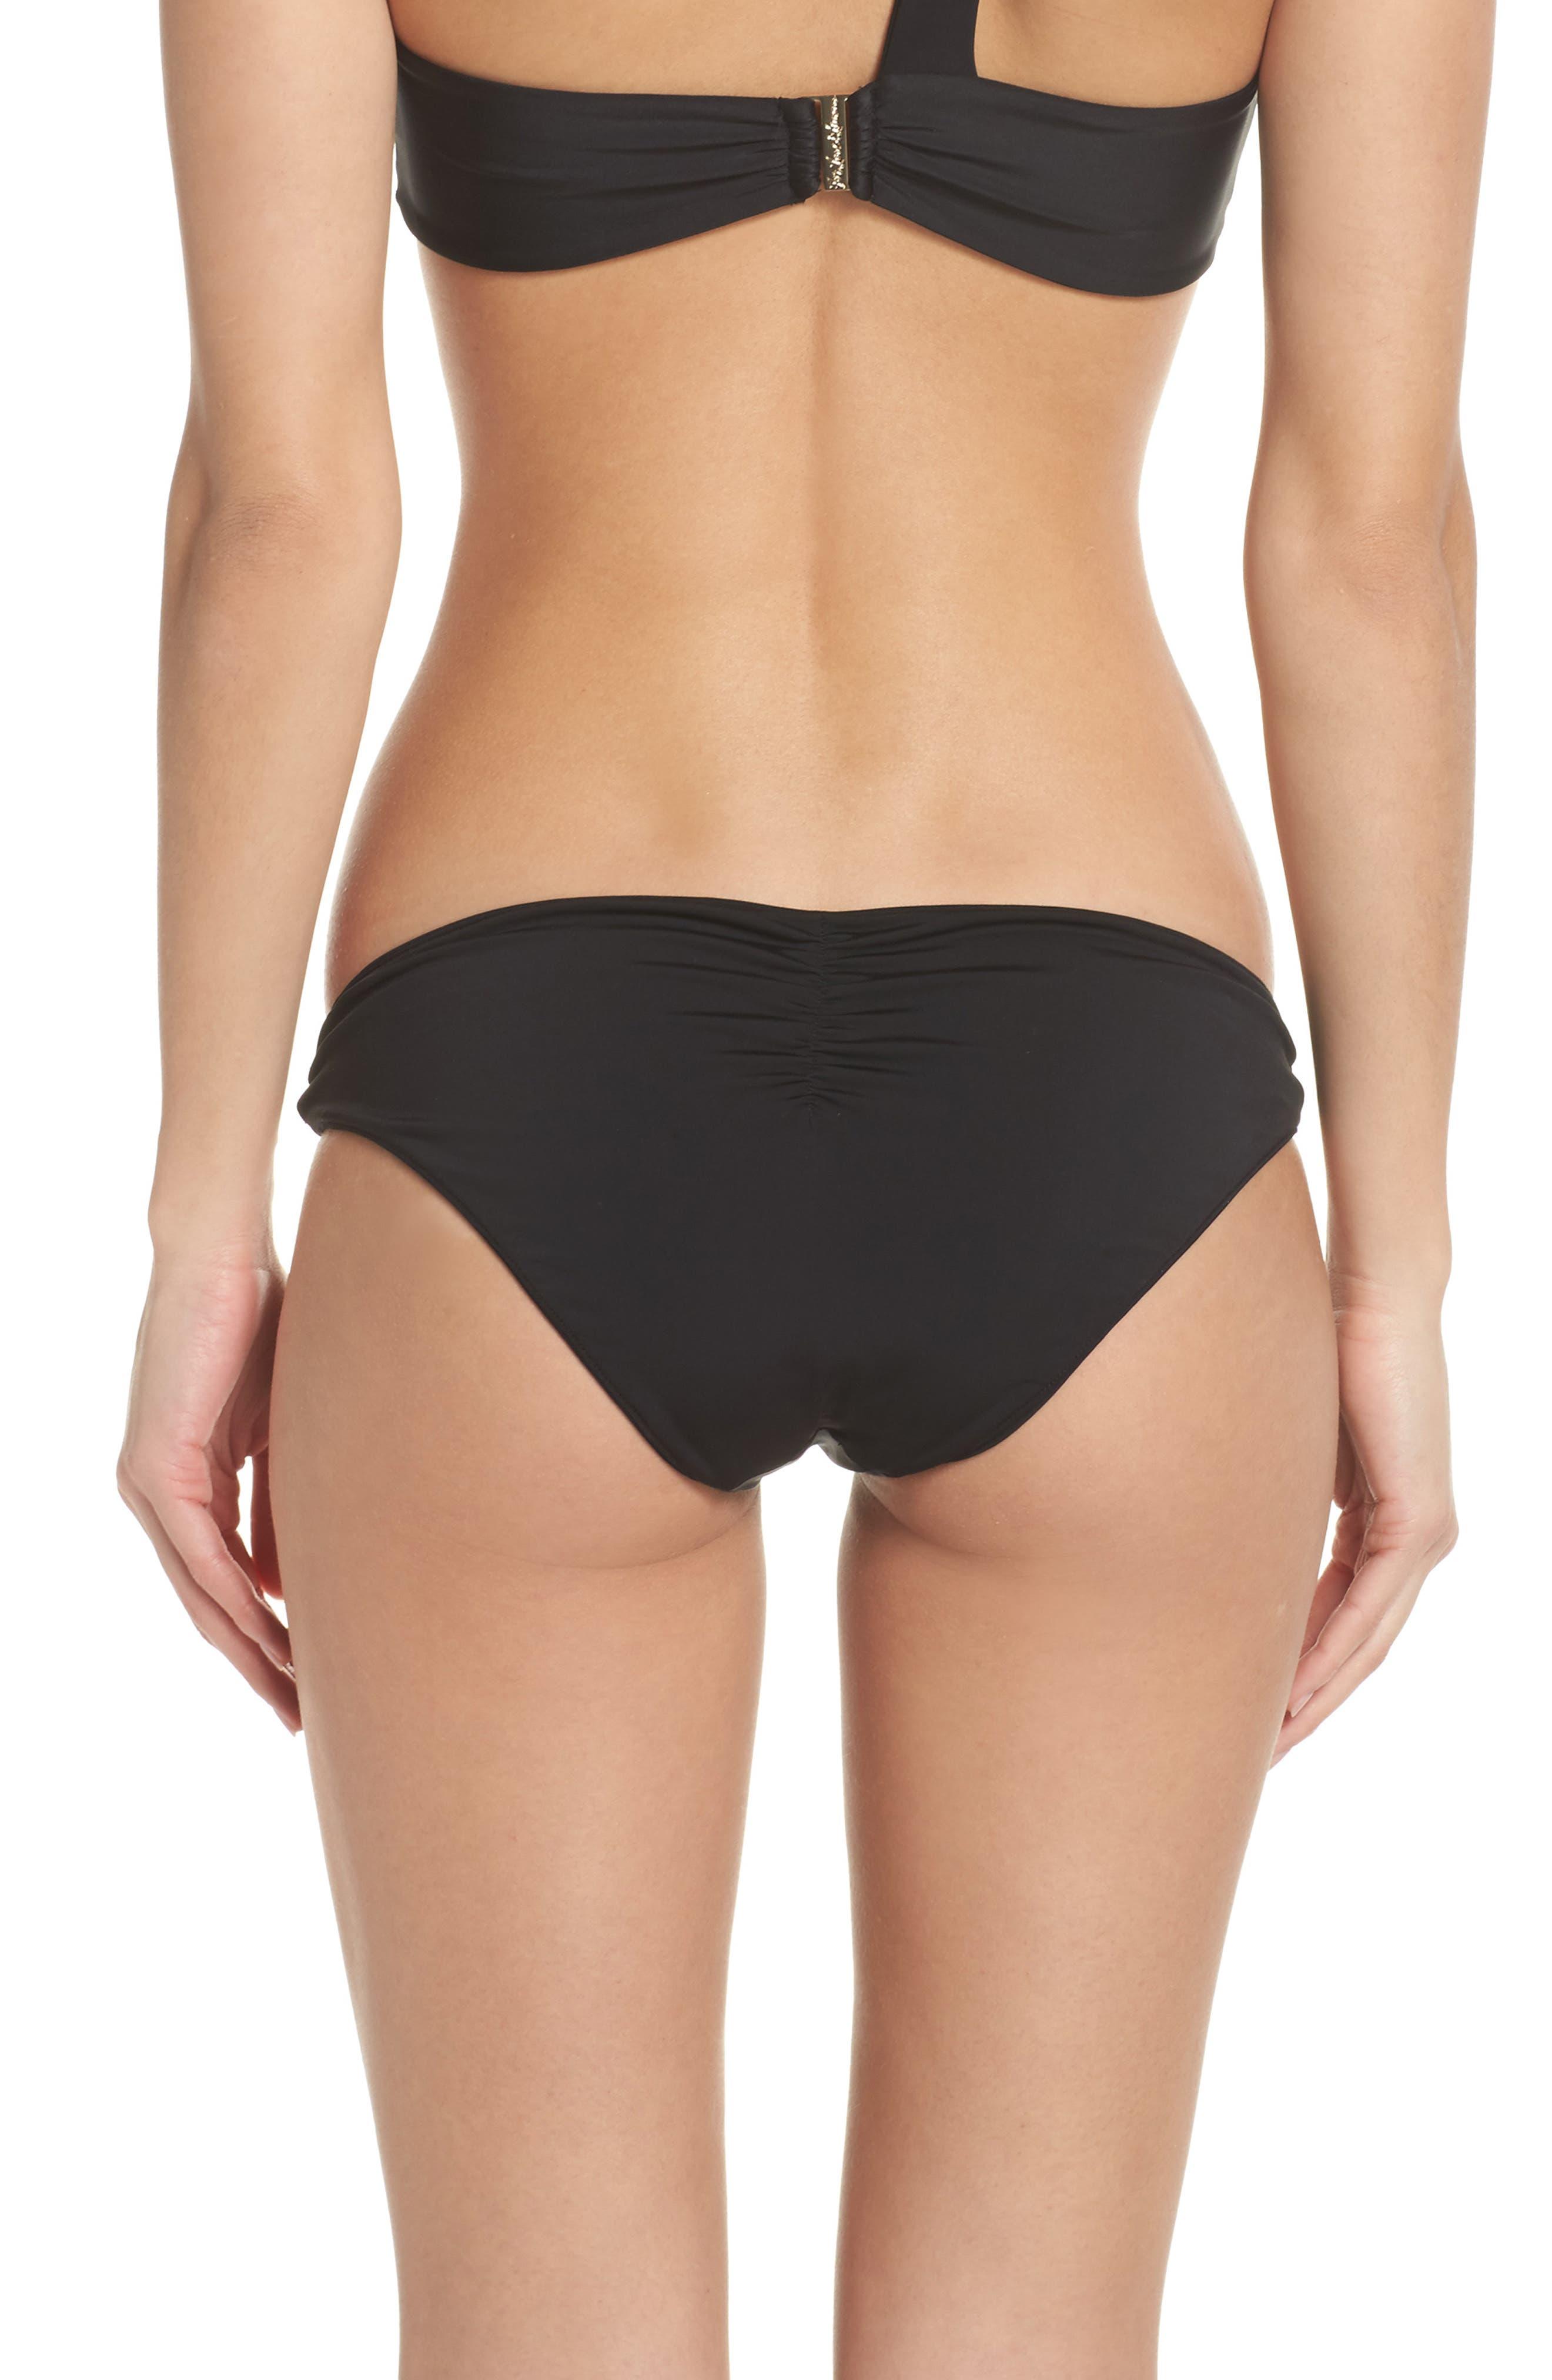 Tropicana Knotted Bikini Bottoms,                             Alternate thumbnail 2, color,                             Black